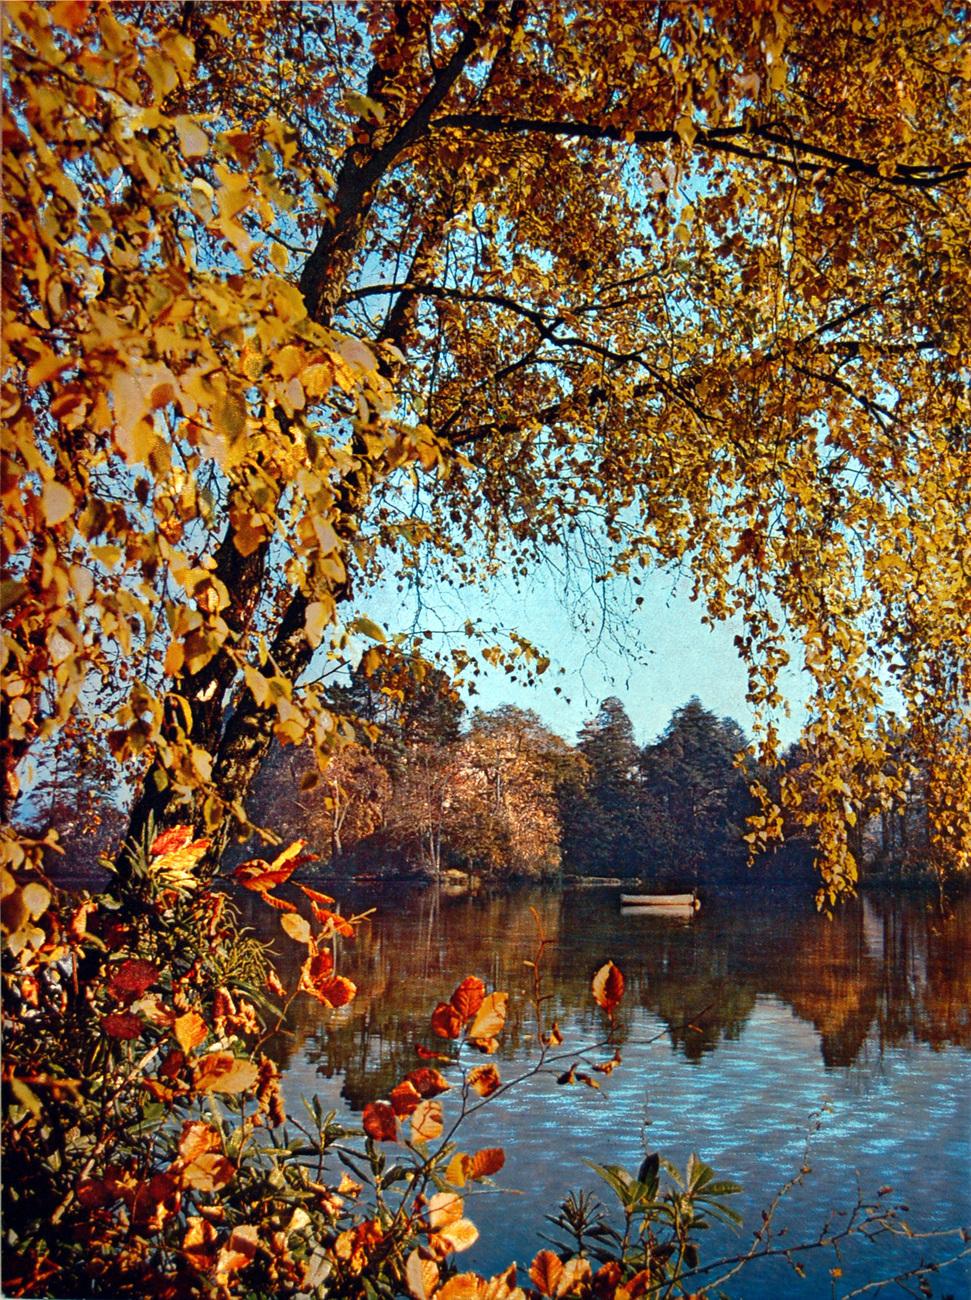 152528 autumn lake at dusk